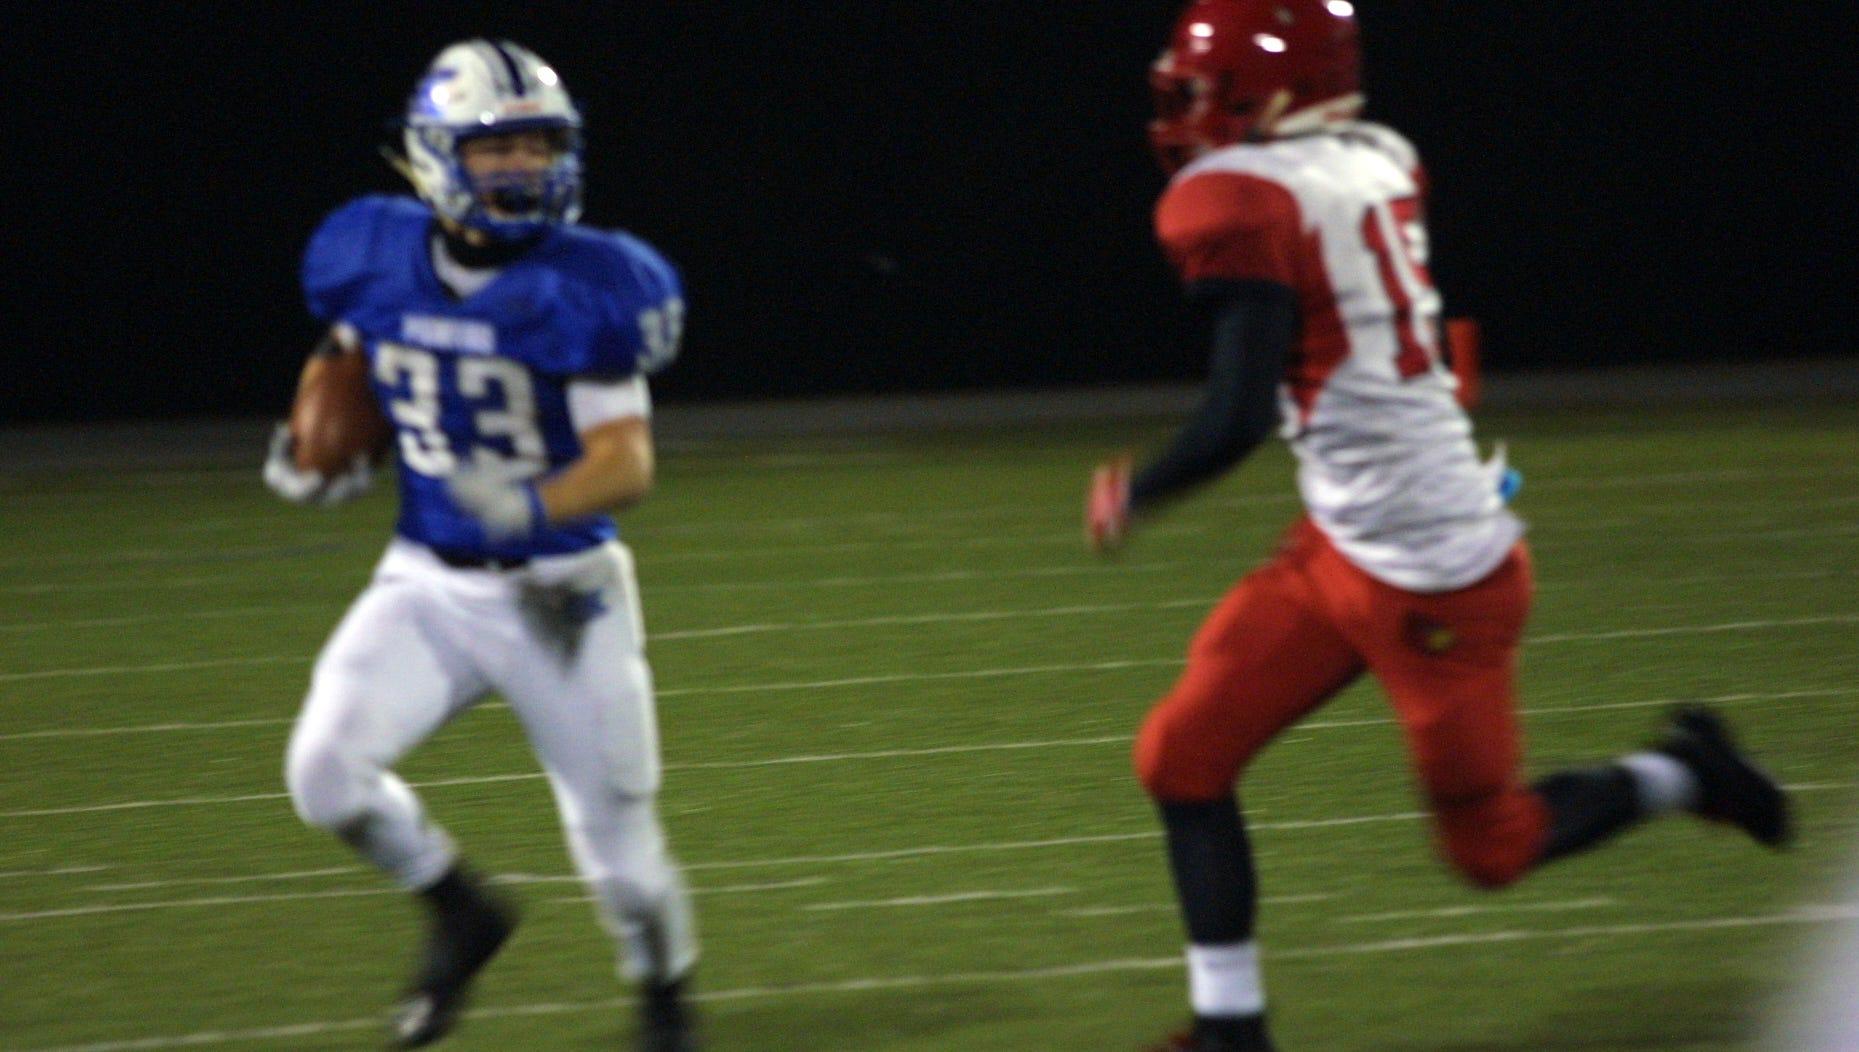 Senior Jon Sergent of Simon Kenton runs for a first down against Scott County in the Kentucky 6A State Football Quarterfinal at Simon Kenton High School, Friday Nov. 16, 2018.